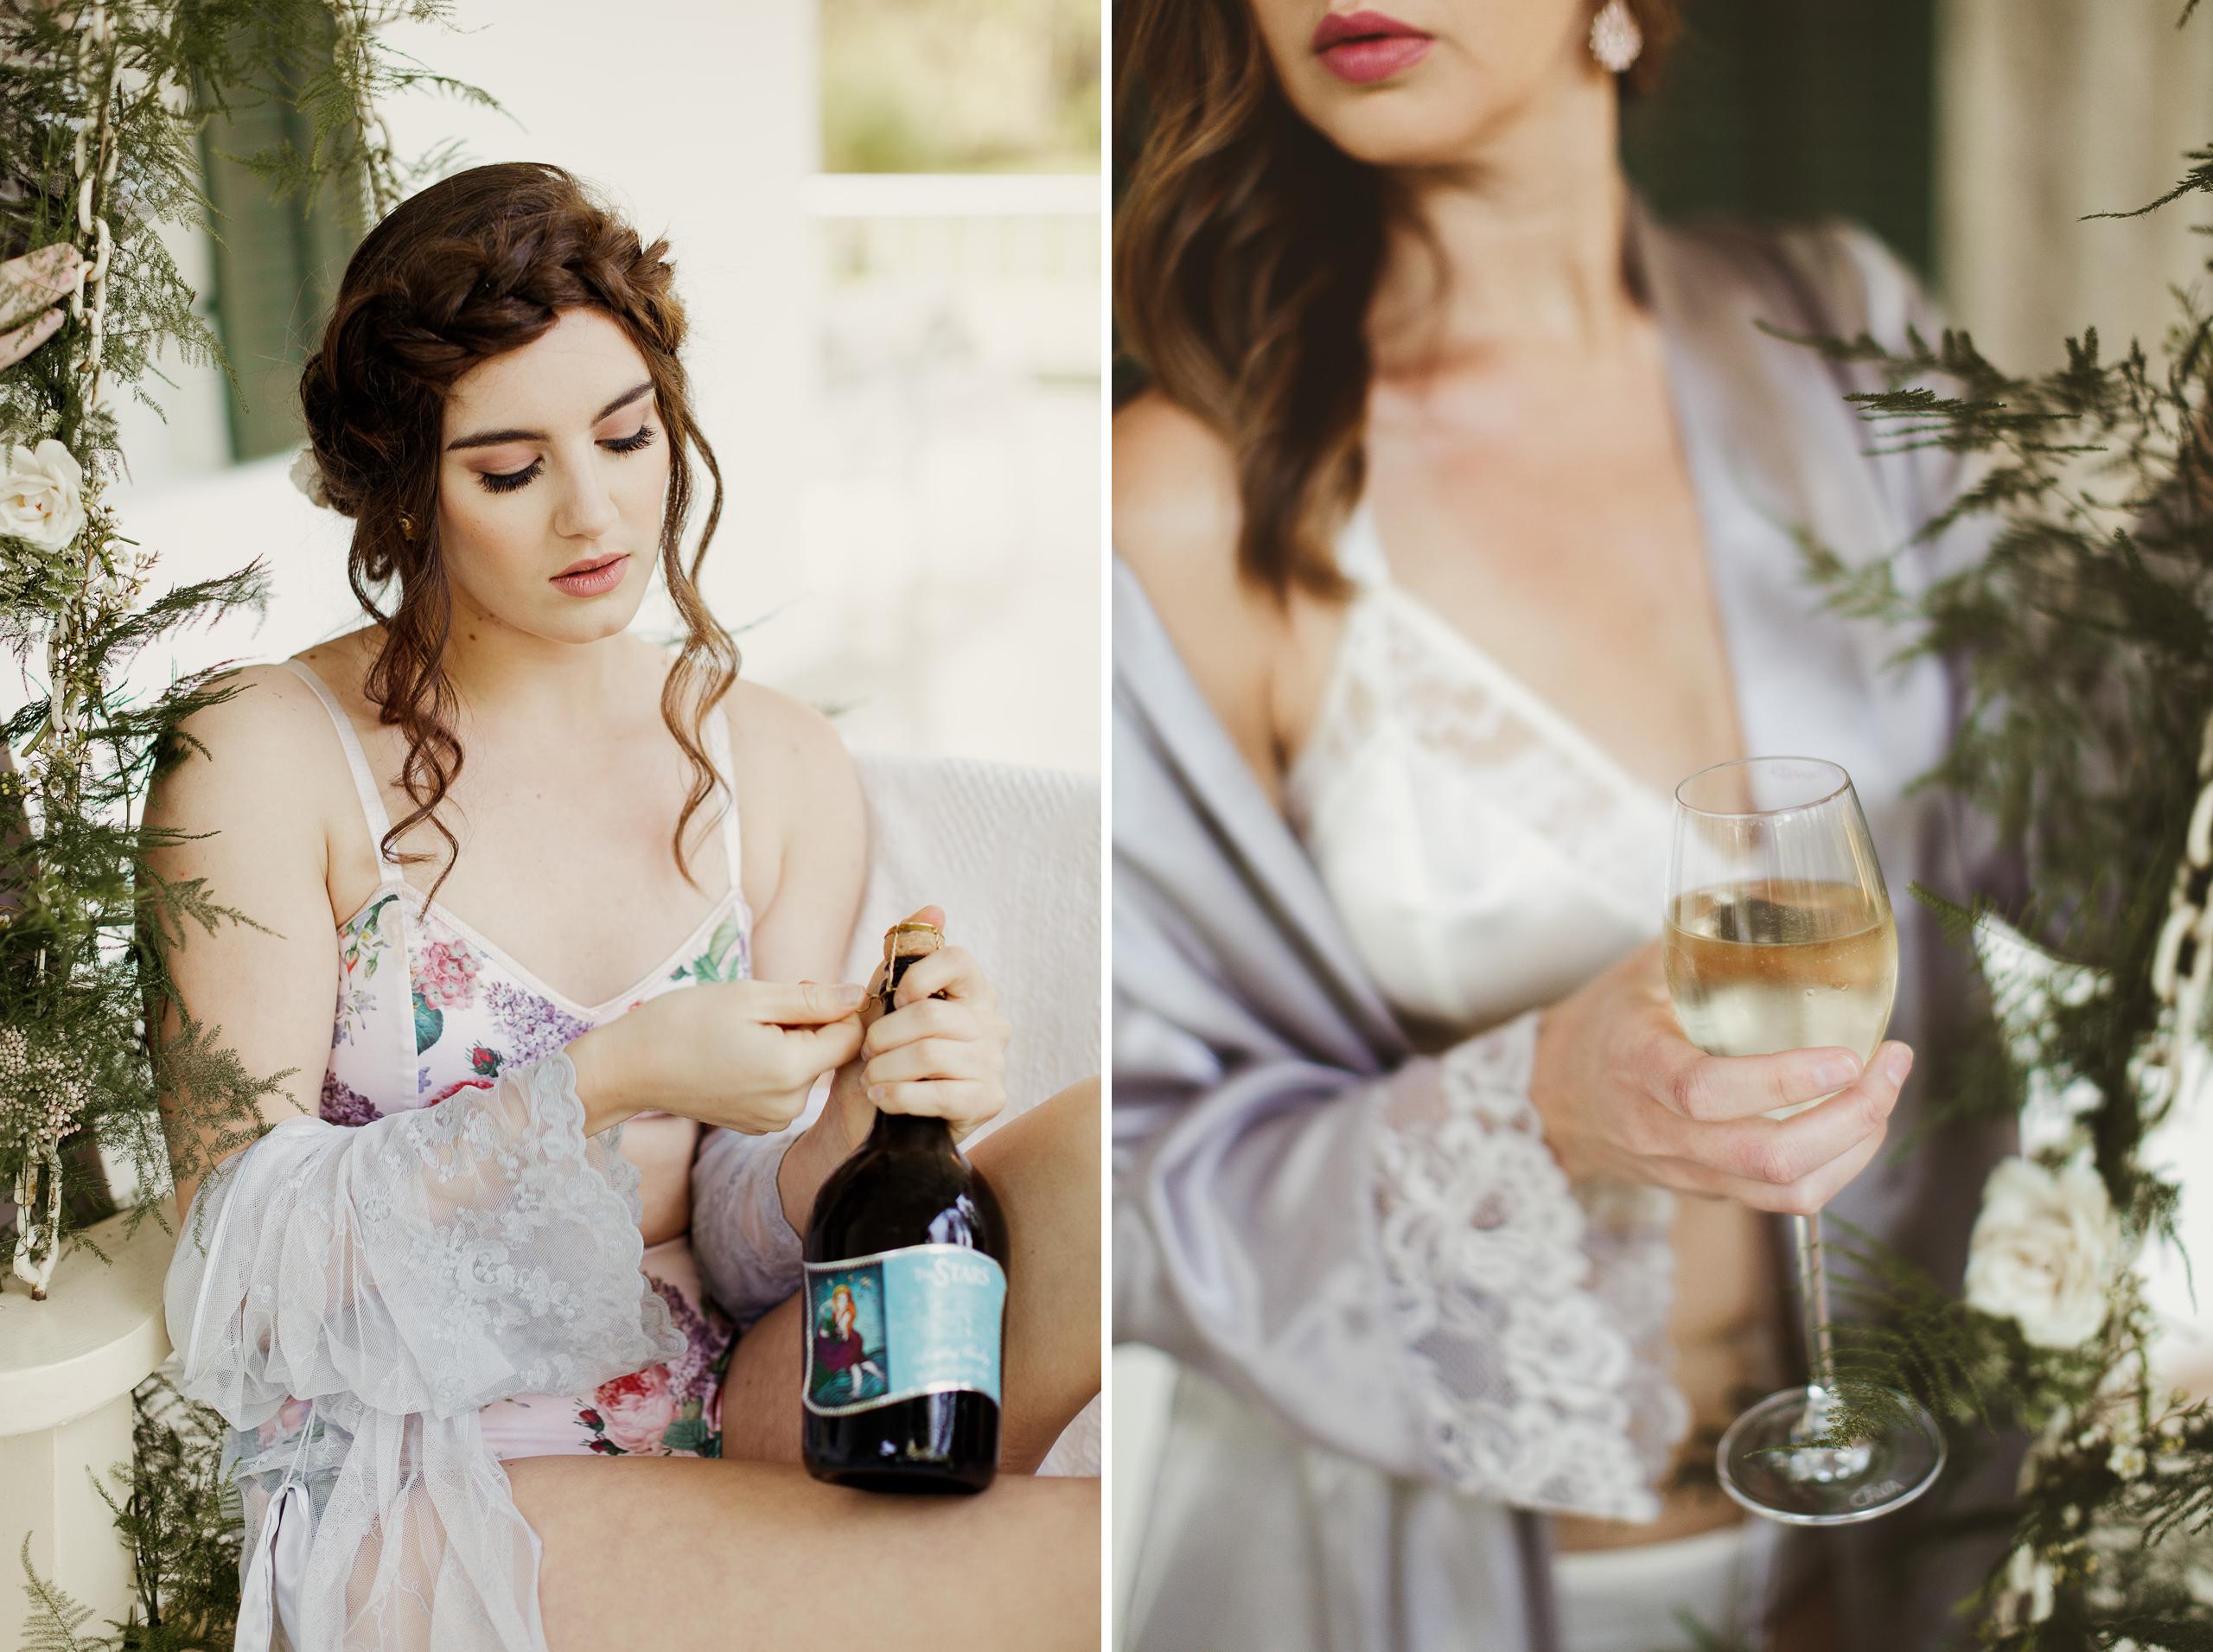 wine region niagara bridesmaids getaway boudoir sexy lingerie spring